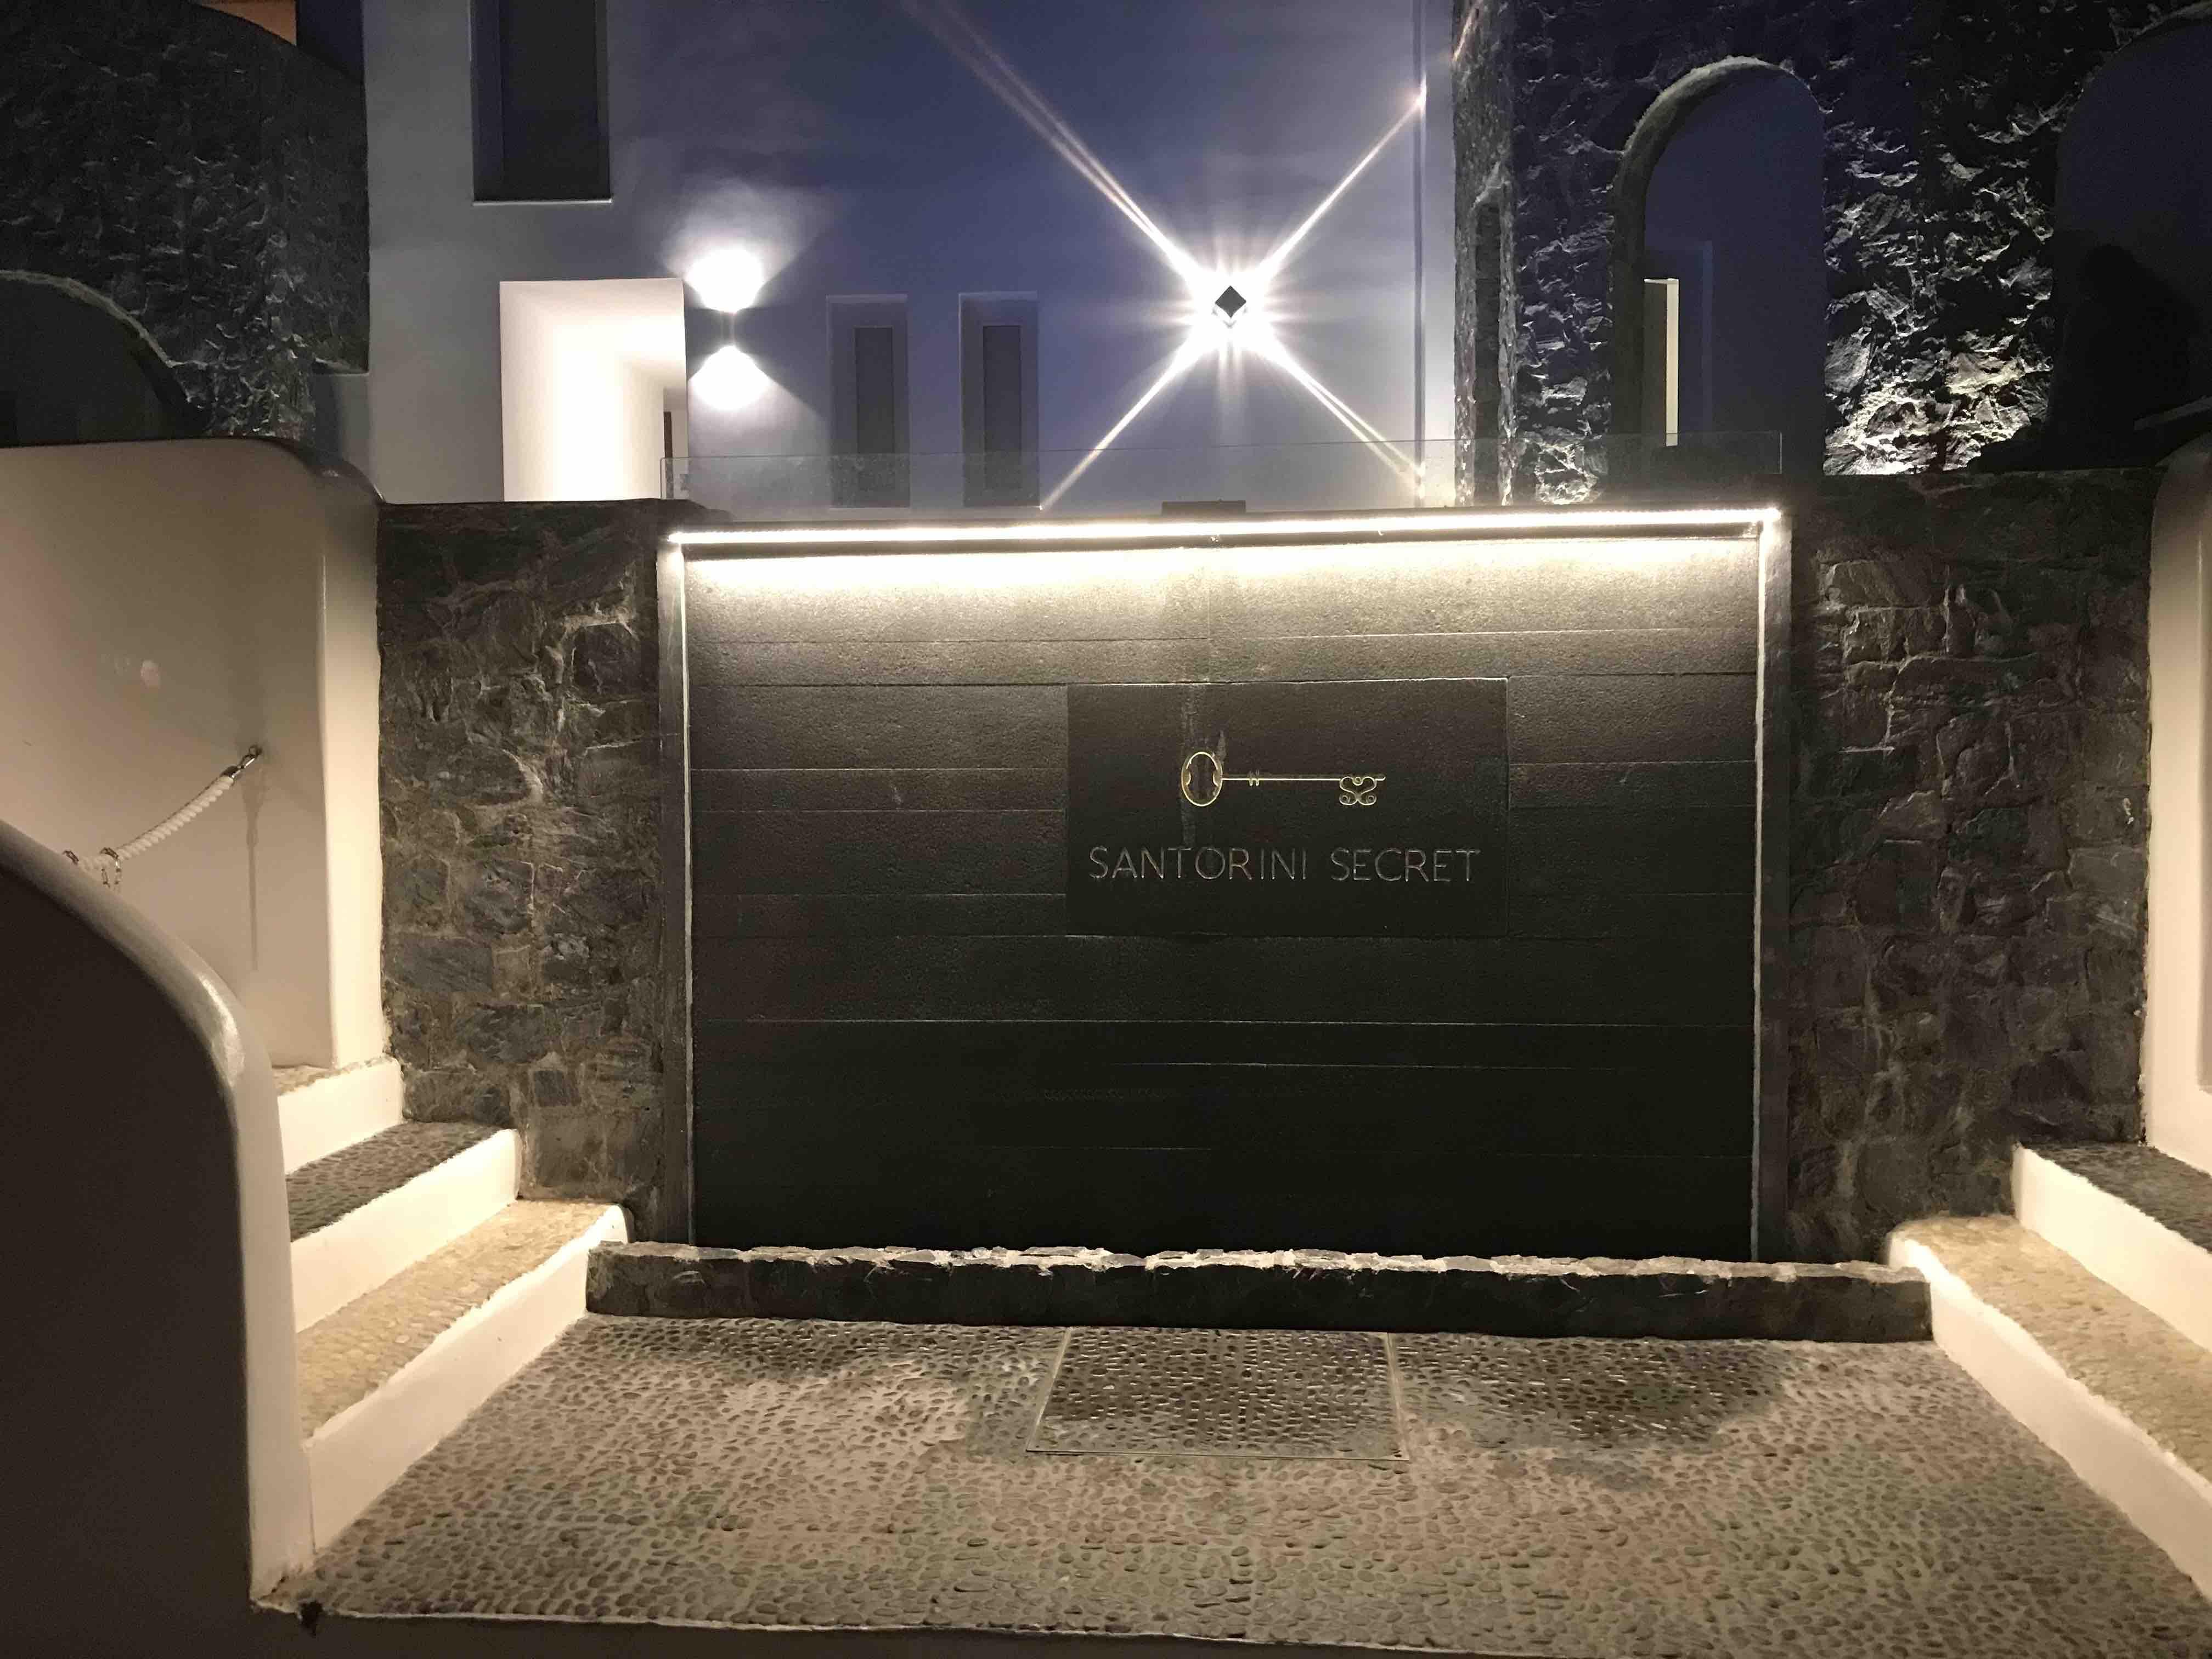 Santorini secret